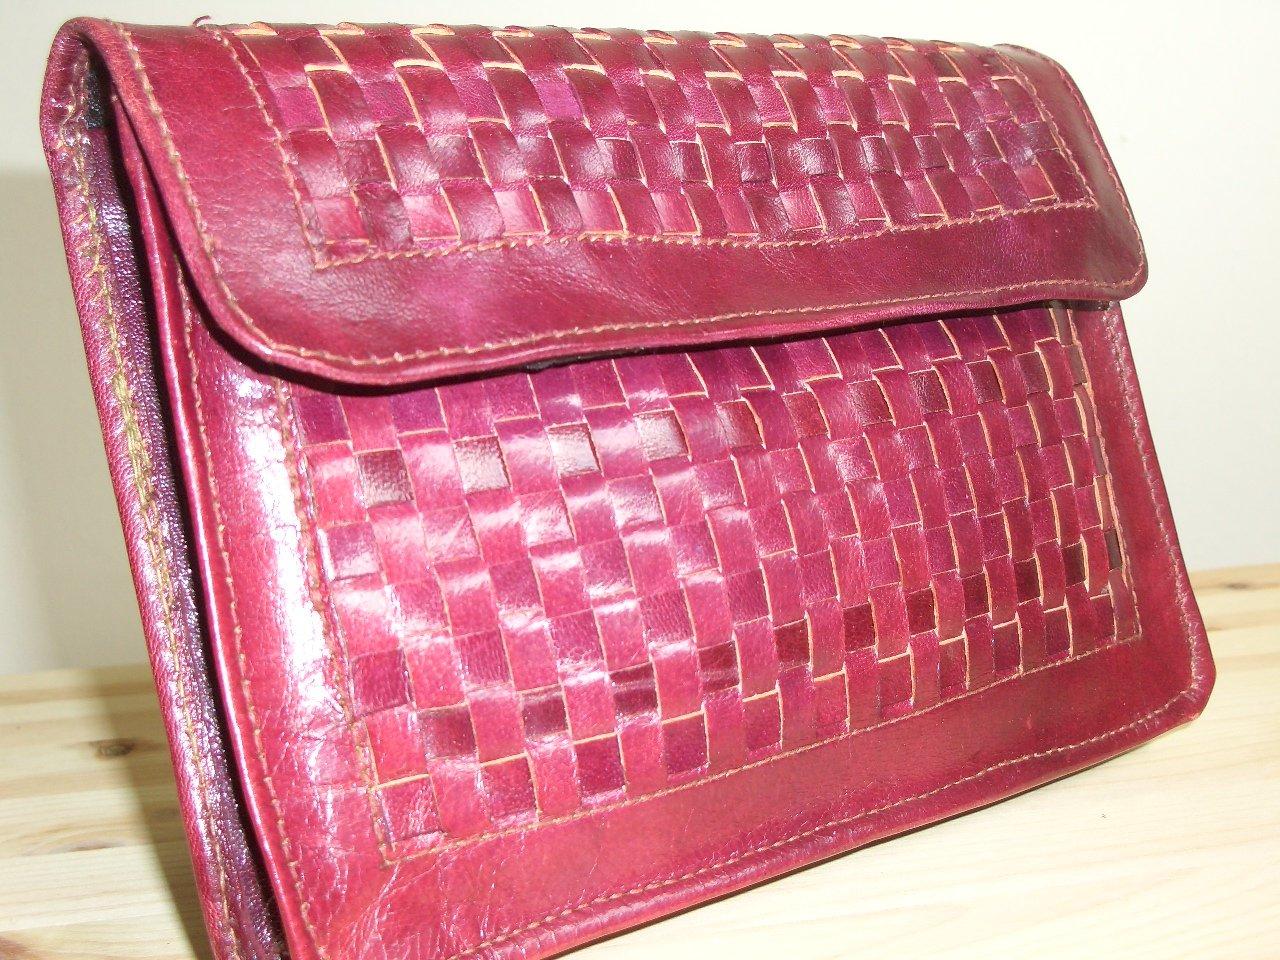 Burgundy Wine Woven Leather Clutch Purse Handbag Stylish Basket Weave Envelope Pocketbook Coin Purse